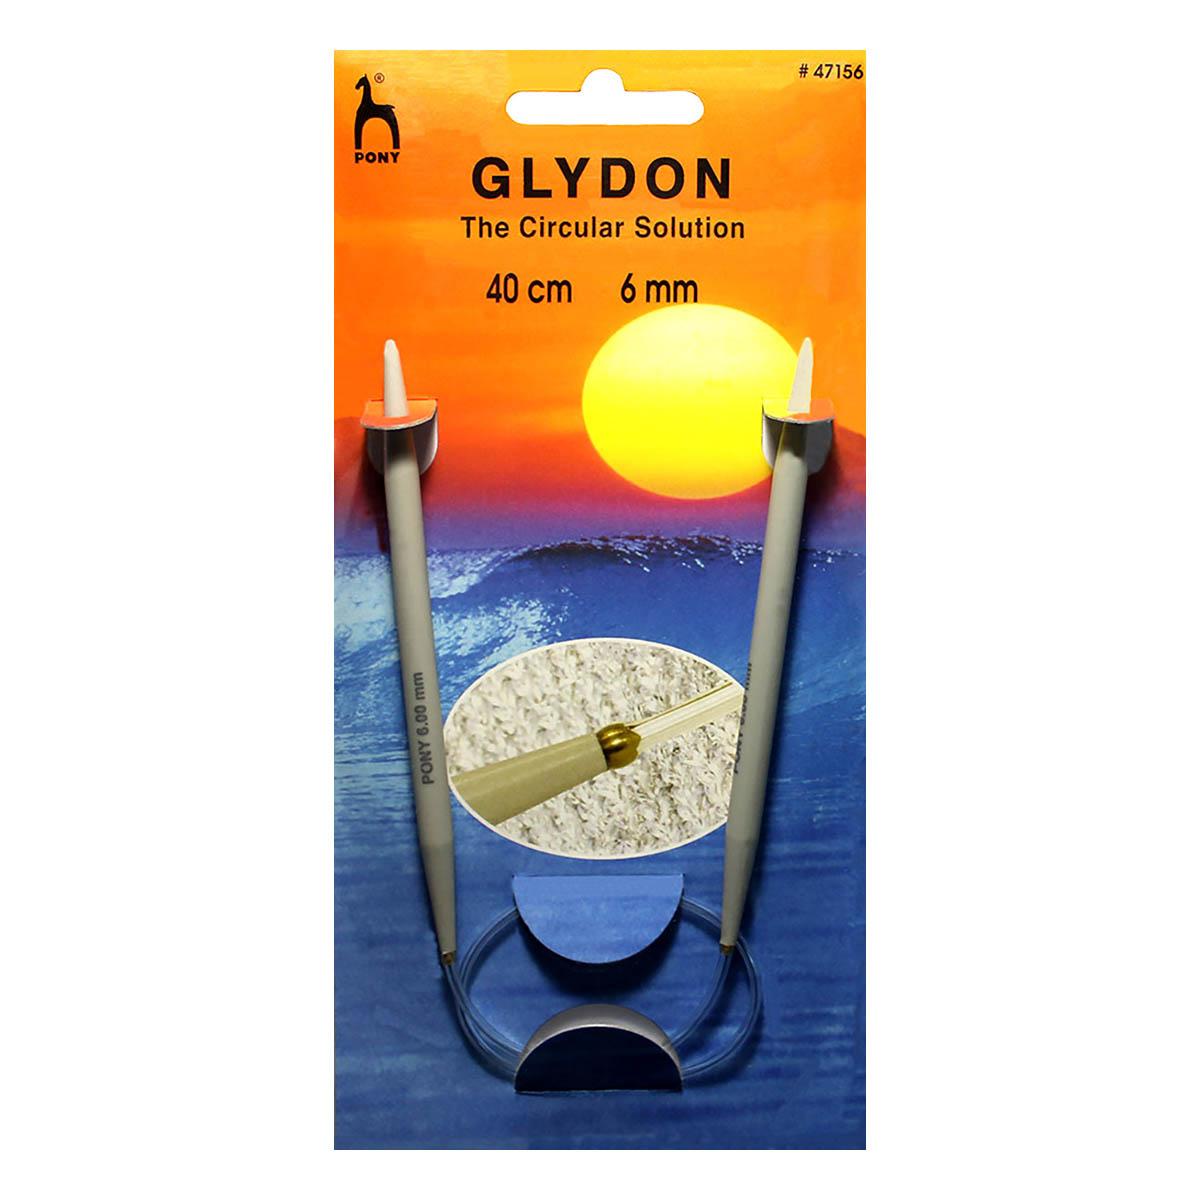 47156 PONY GLYDON Спицы круговые 6,00 мм/ 40 см, пластик, 2 шт